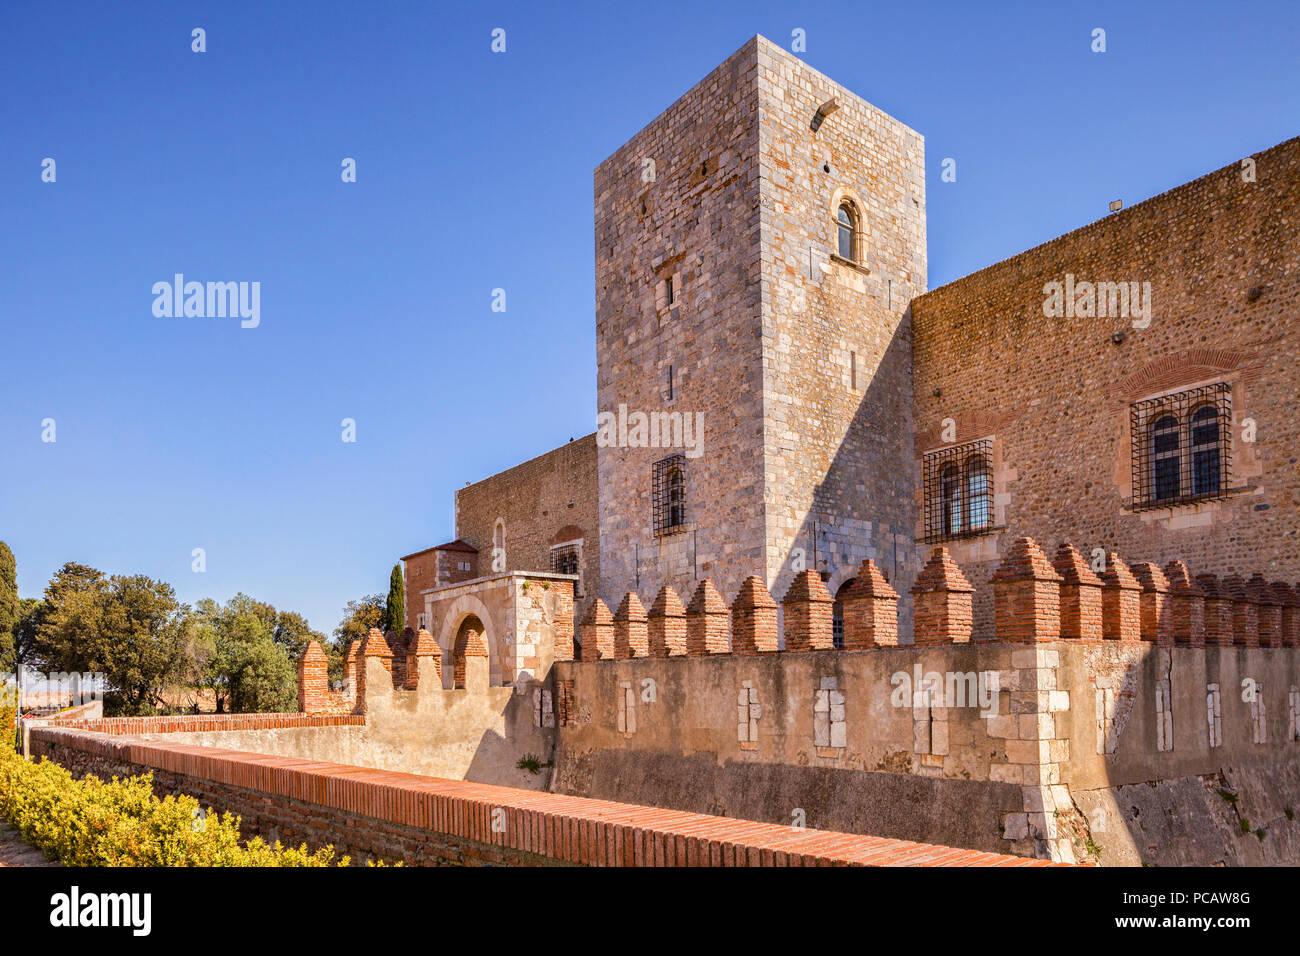 Palacio de los reyes de Mallorca, Perpignan, Languedoc-Roussillon, Pirineos Orientales, Francia. Imagen De Stock